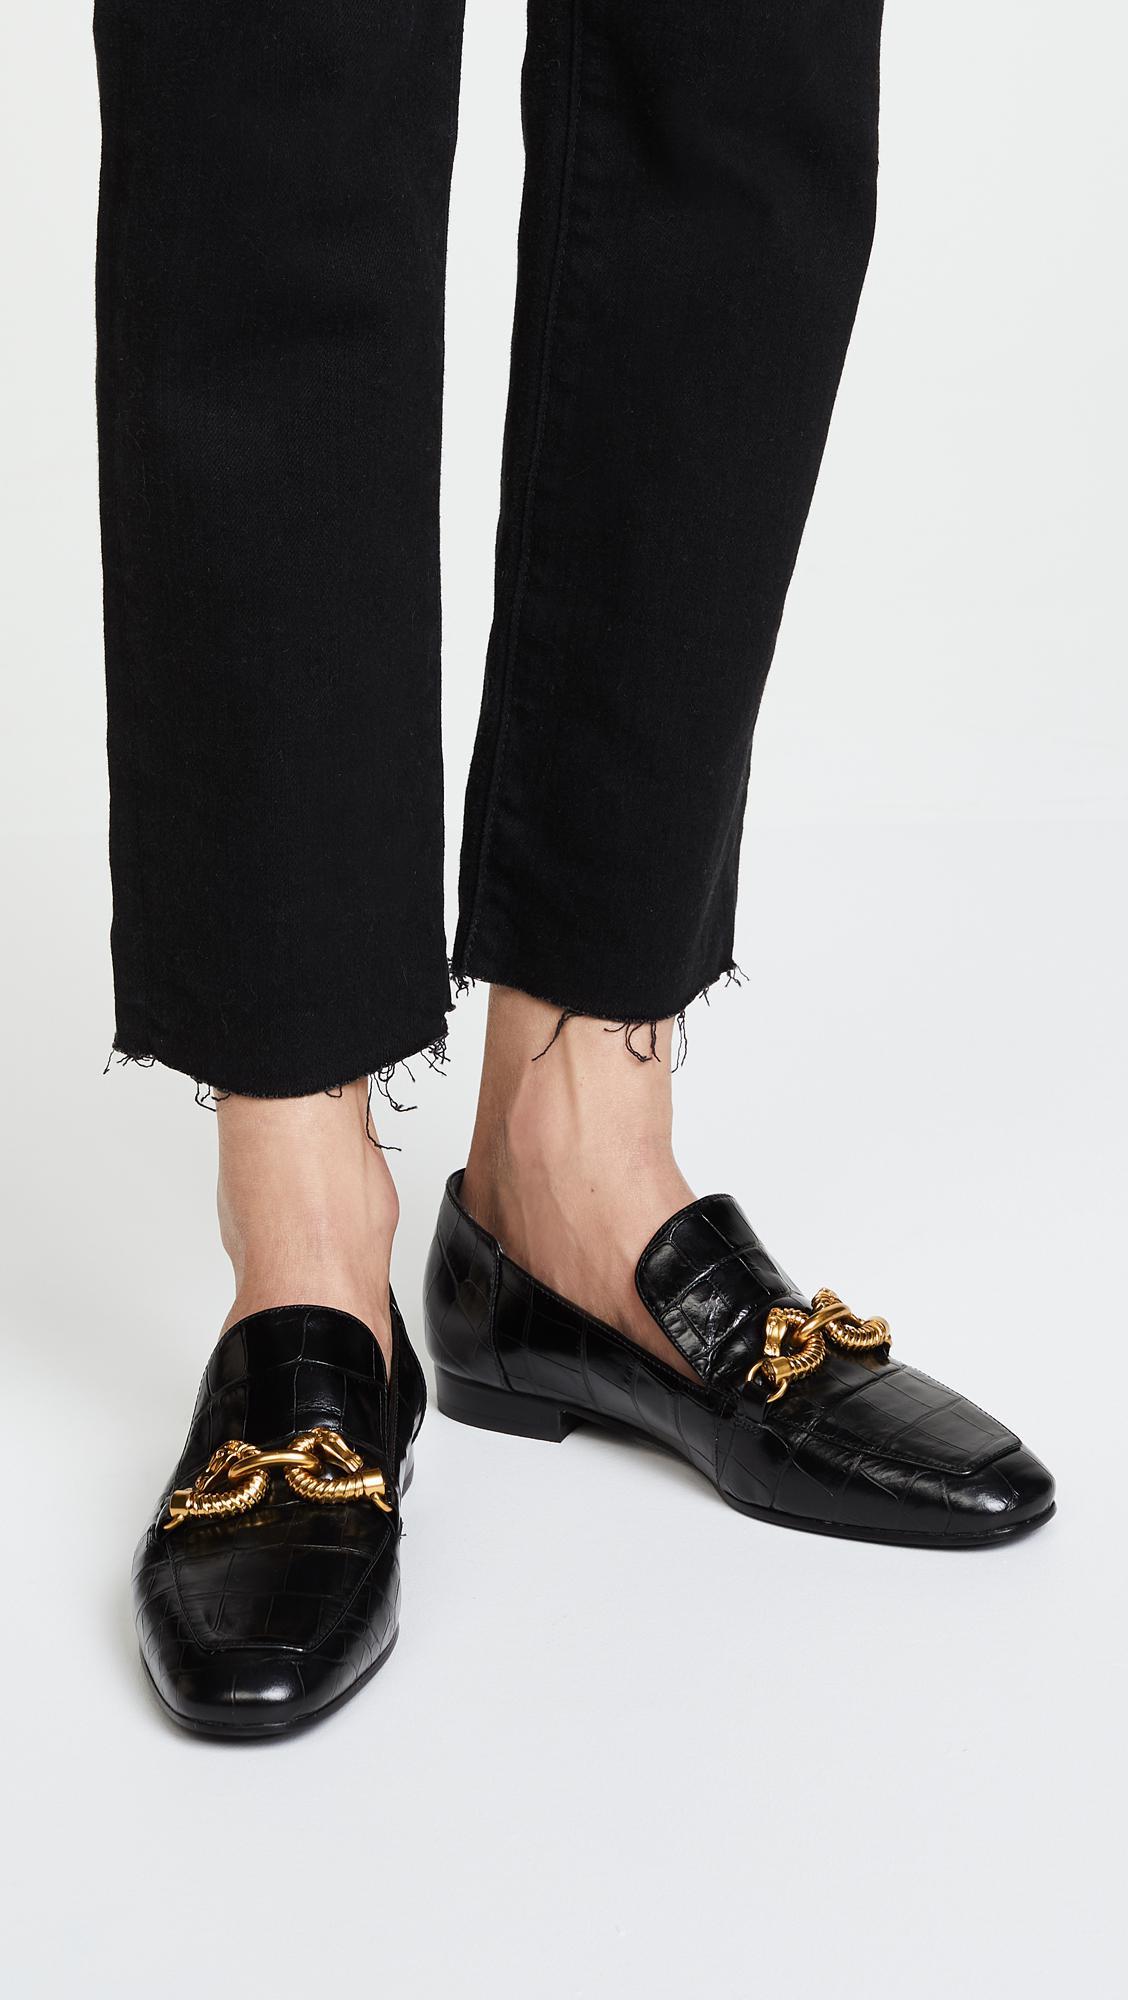 50c21038598 Lyst - Tory Burch Jessa Horse Hardware Loafers in Black